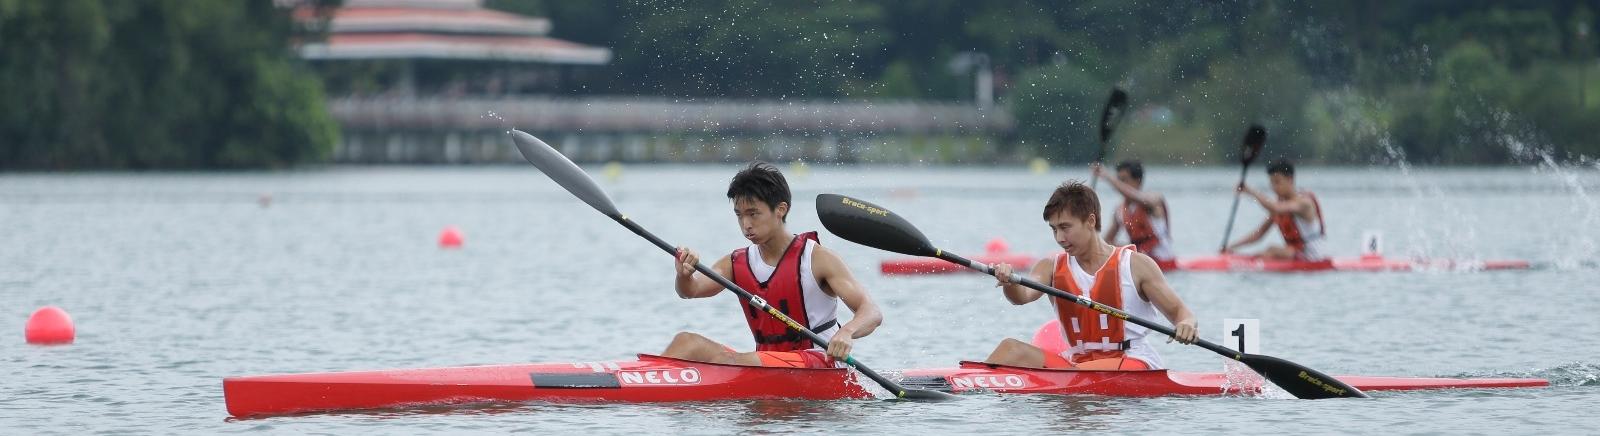 2019 Pol-ITE Canoe Sprint Championships